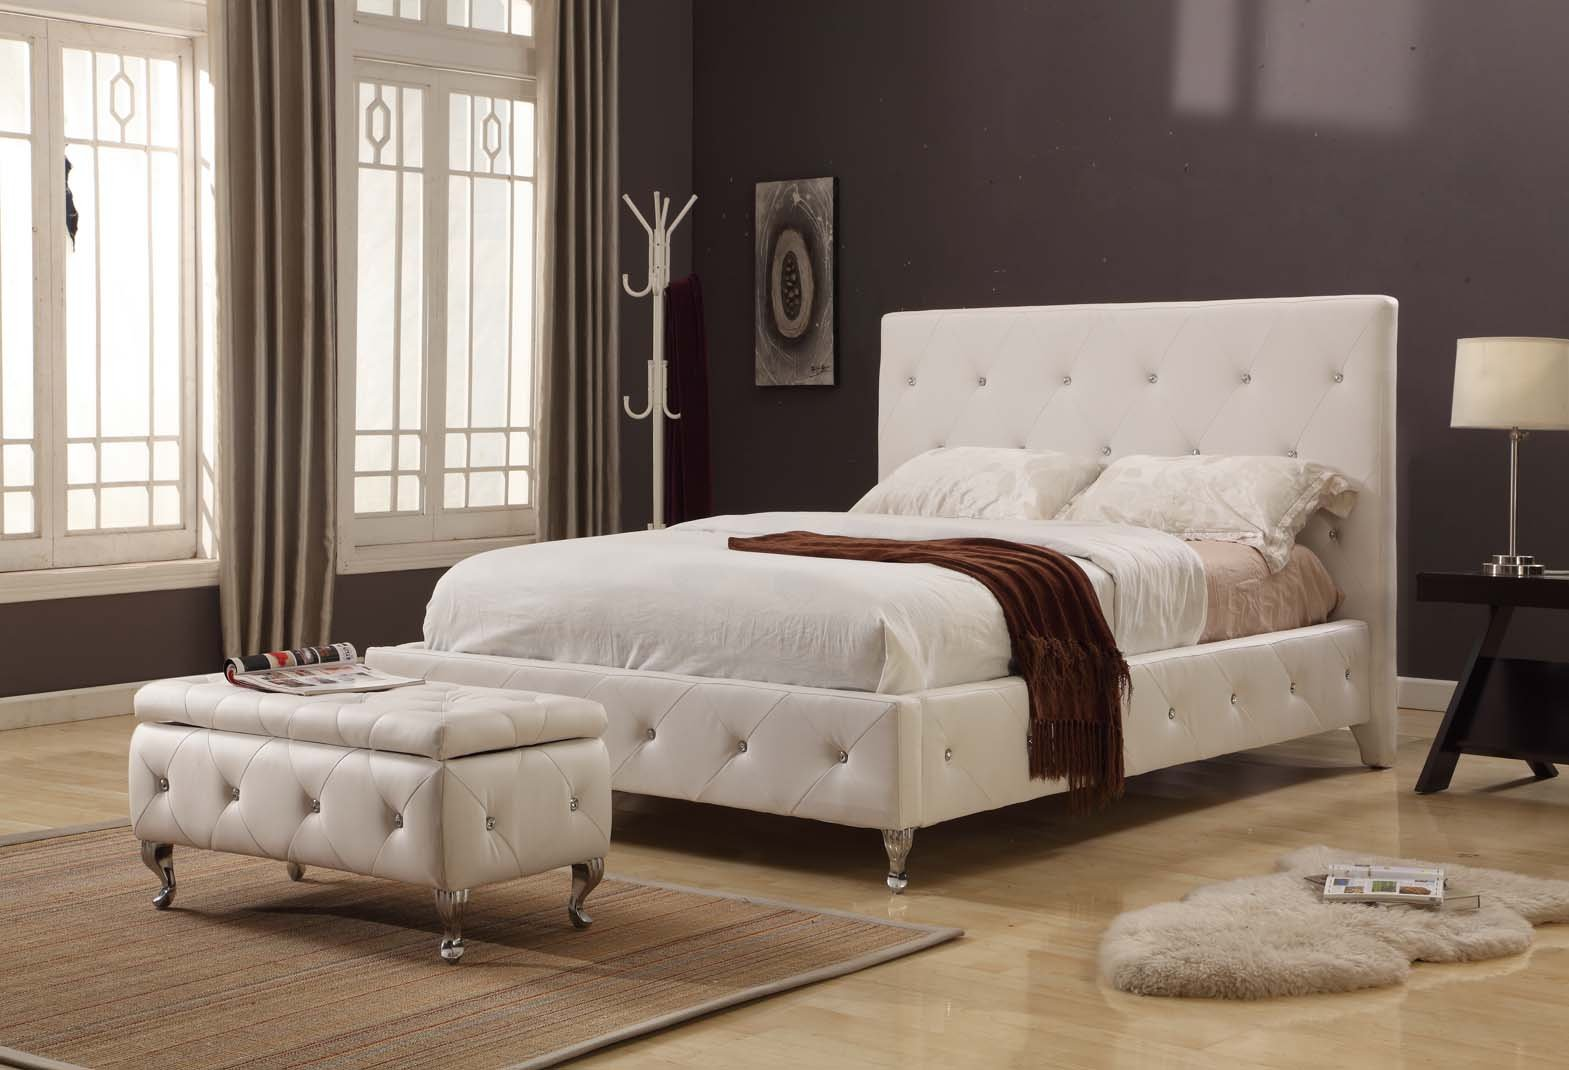 White Tufted Design Leather Look Full Size Upholstered Platform Bed